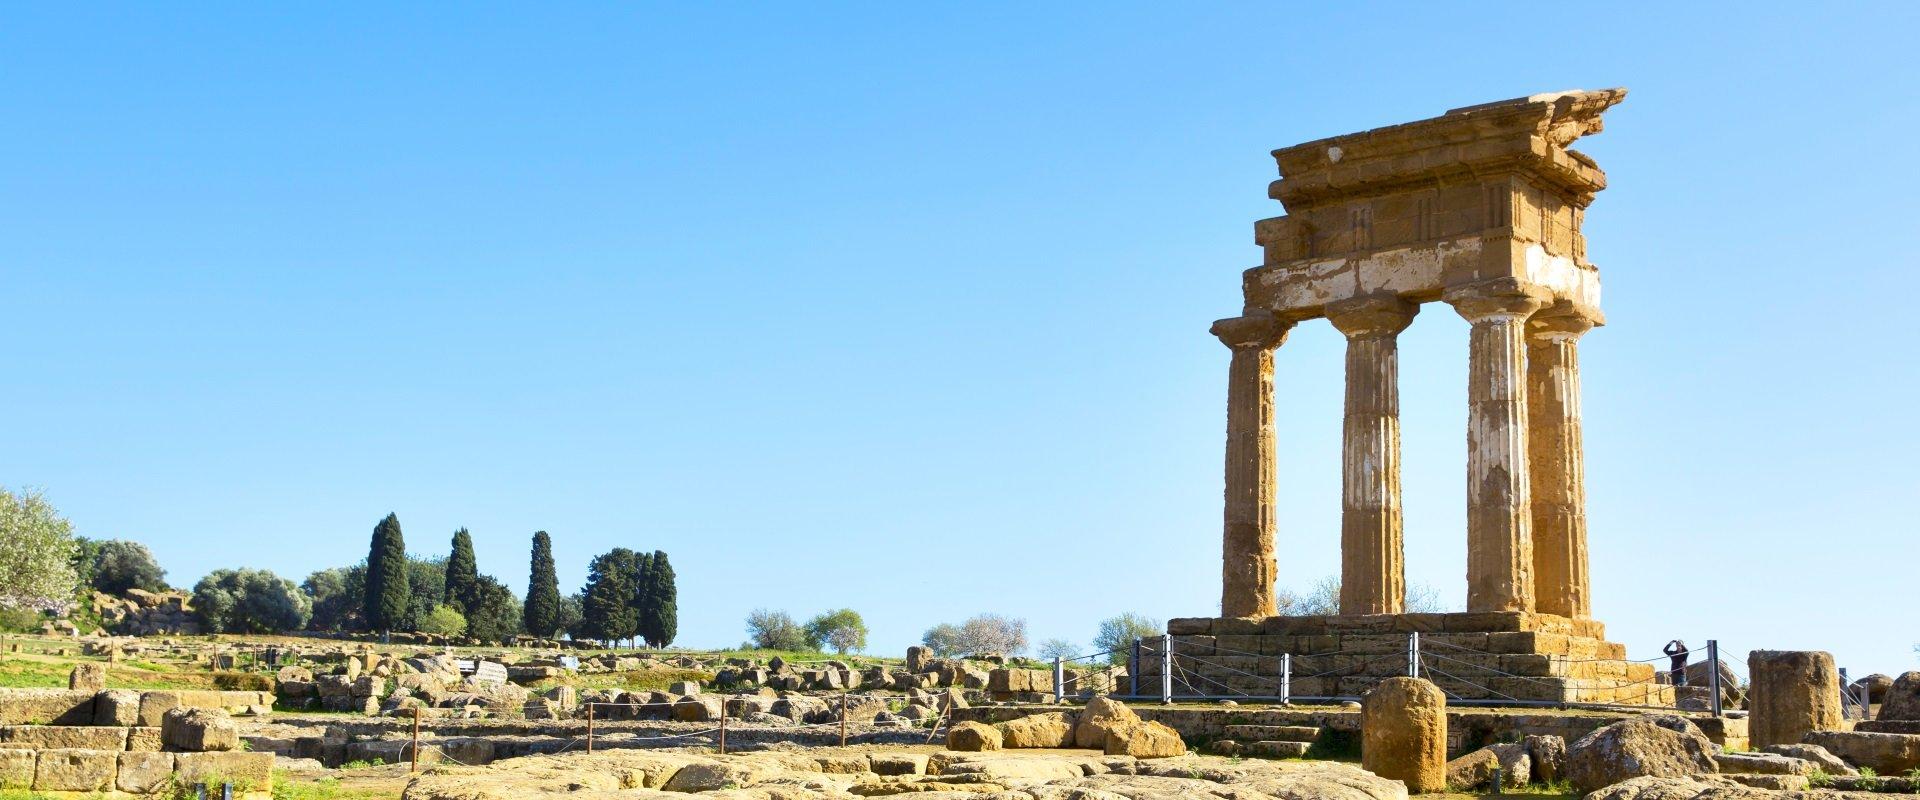 agrigento tempel van dioscuri.jpg